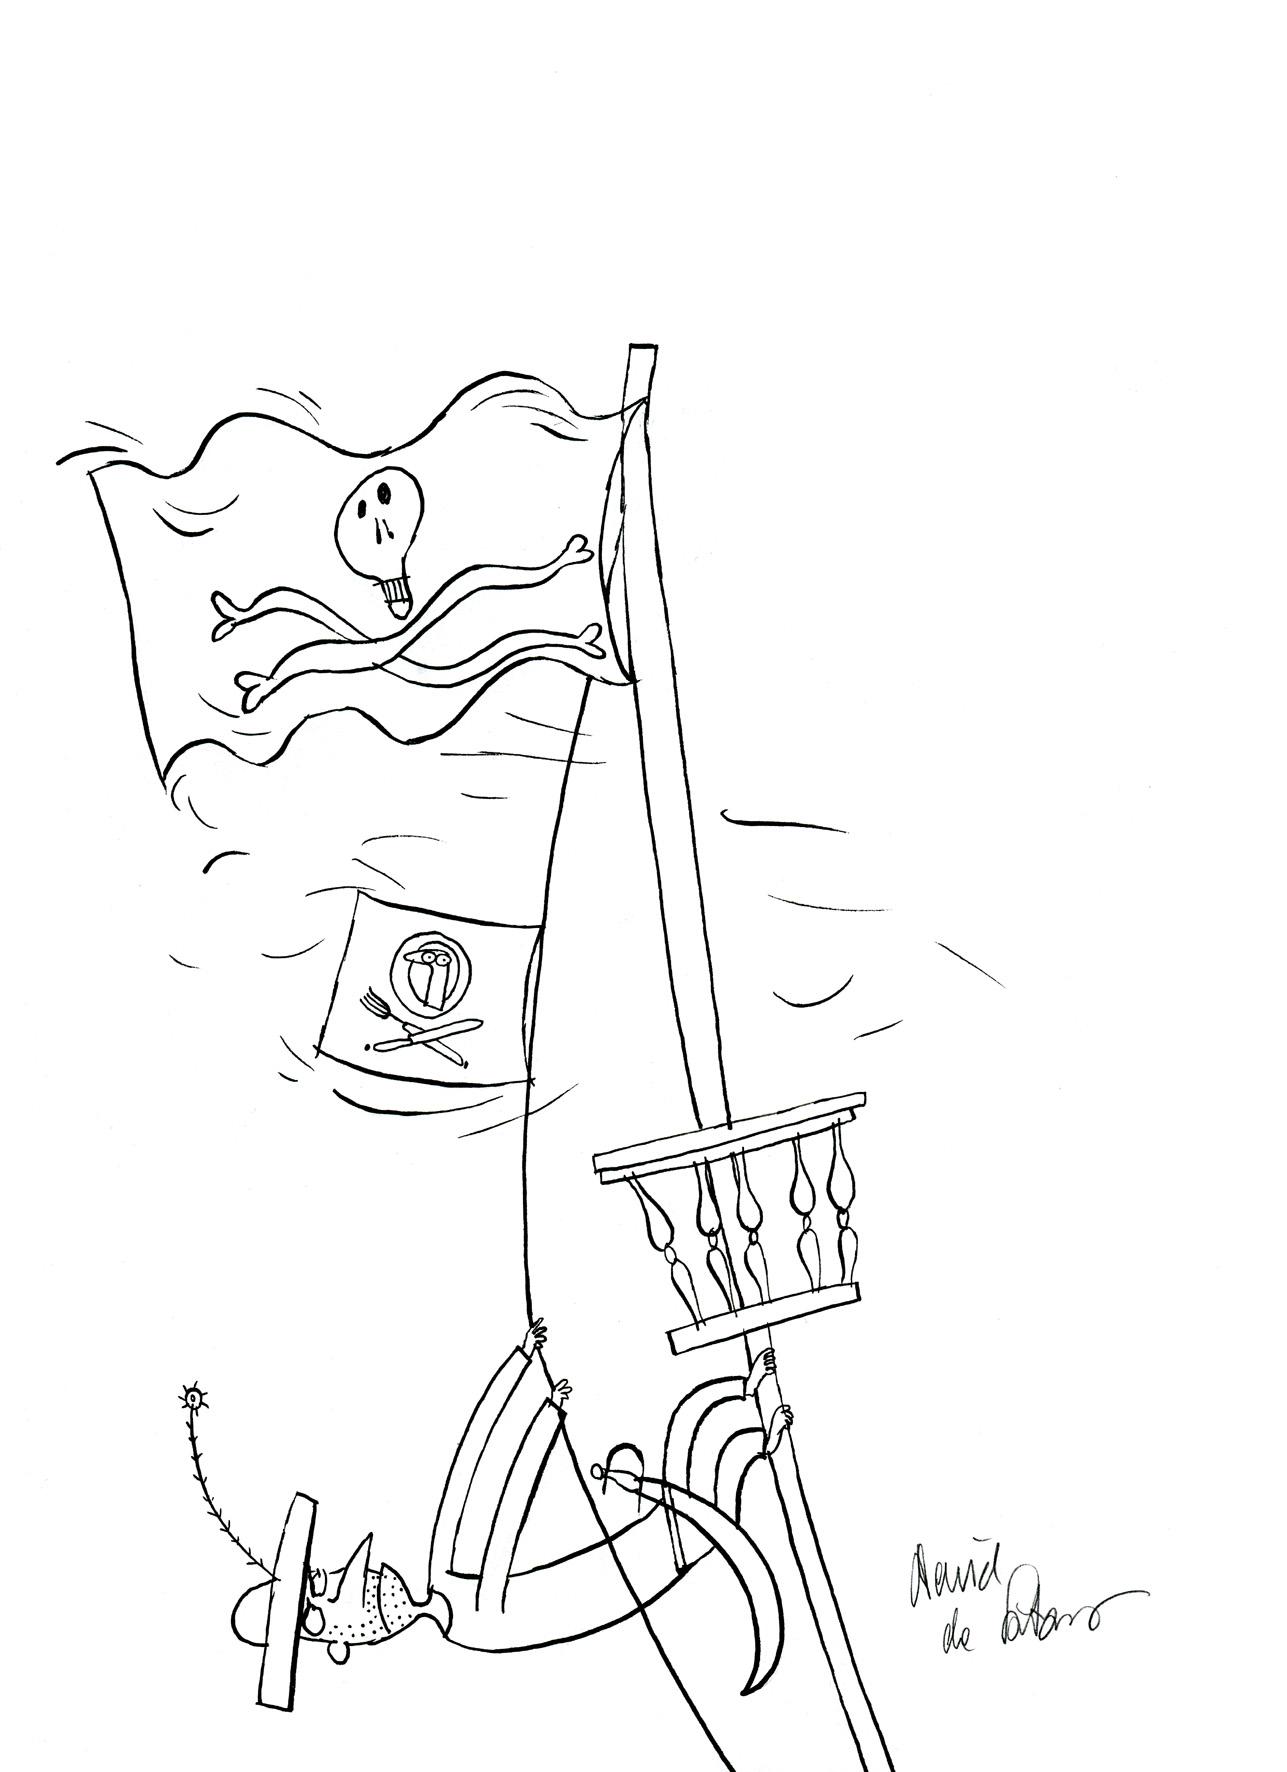 "Ilustracja do książki Justyny Bednarek ""Banda Czarnej Frotté"", 2020"